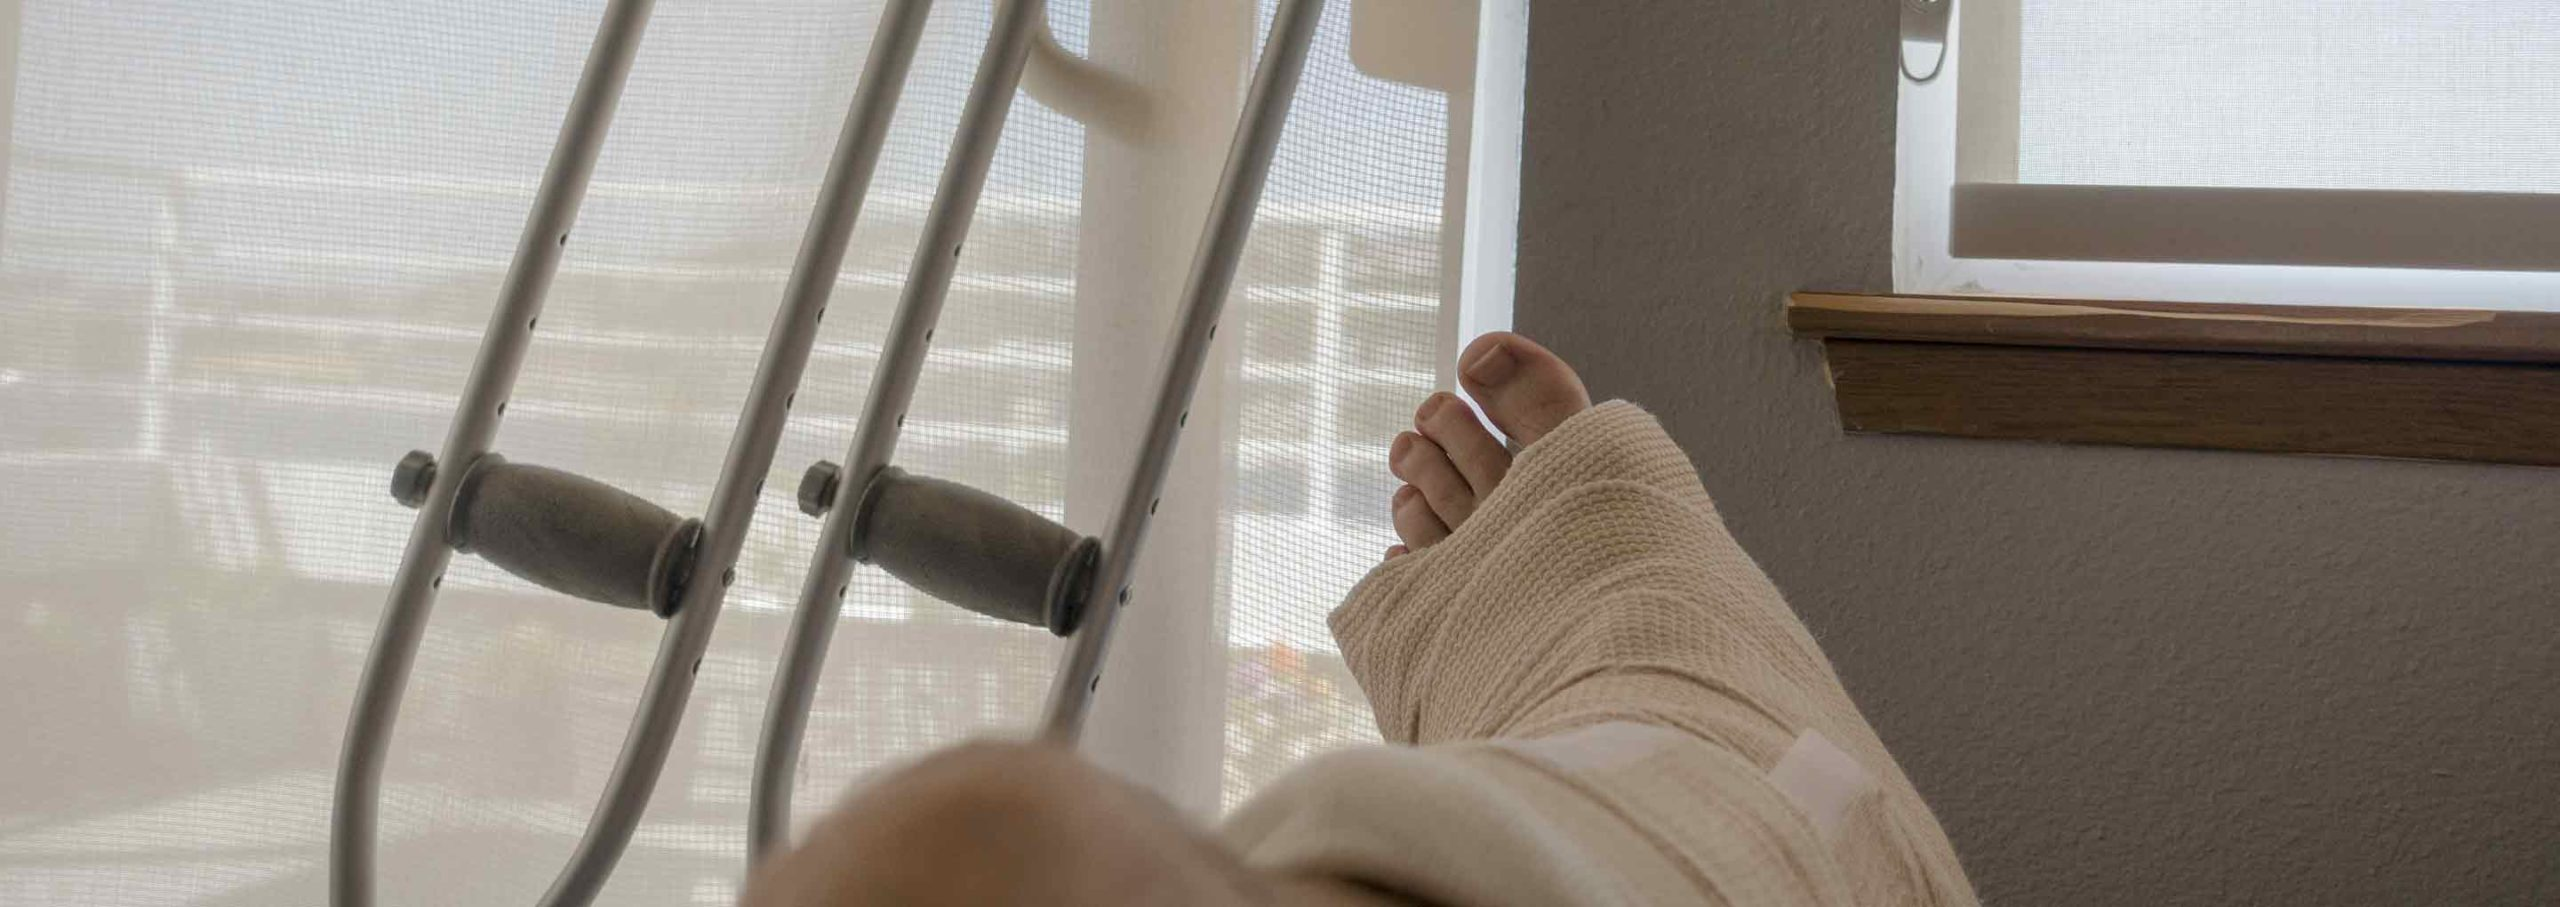 personl injury